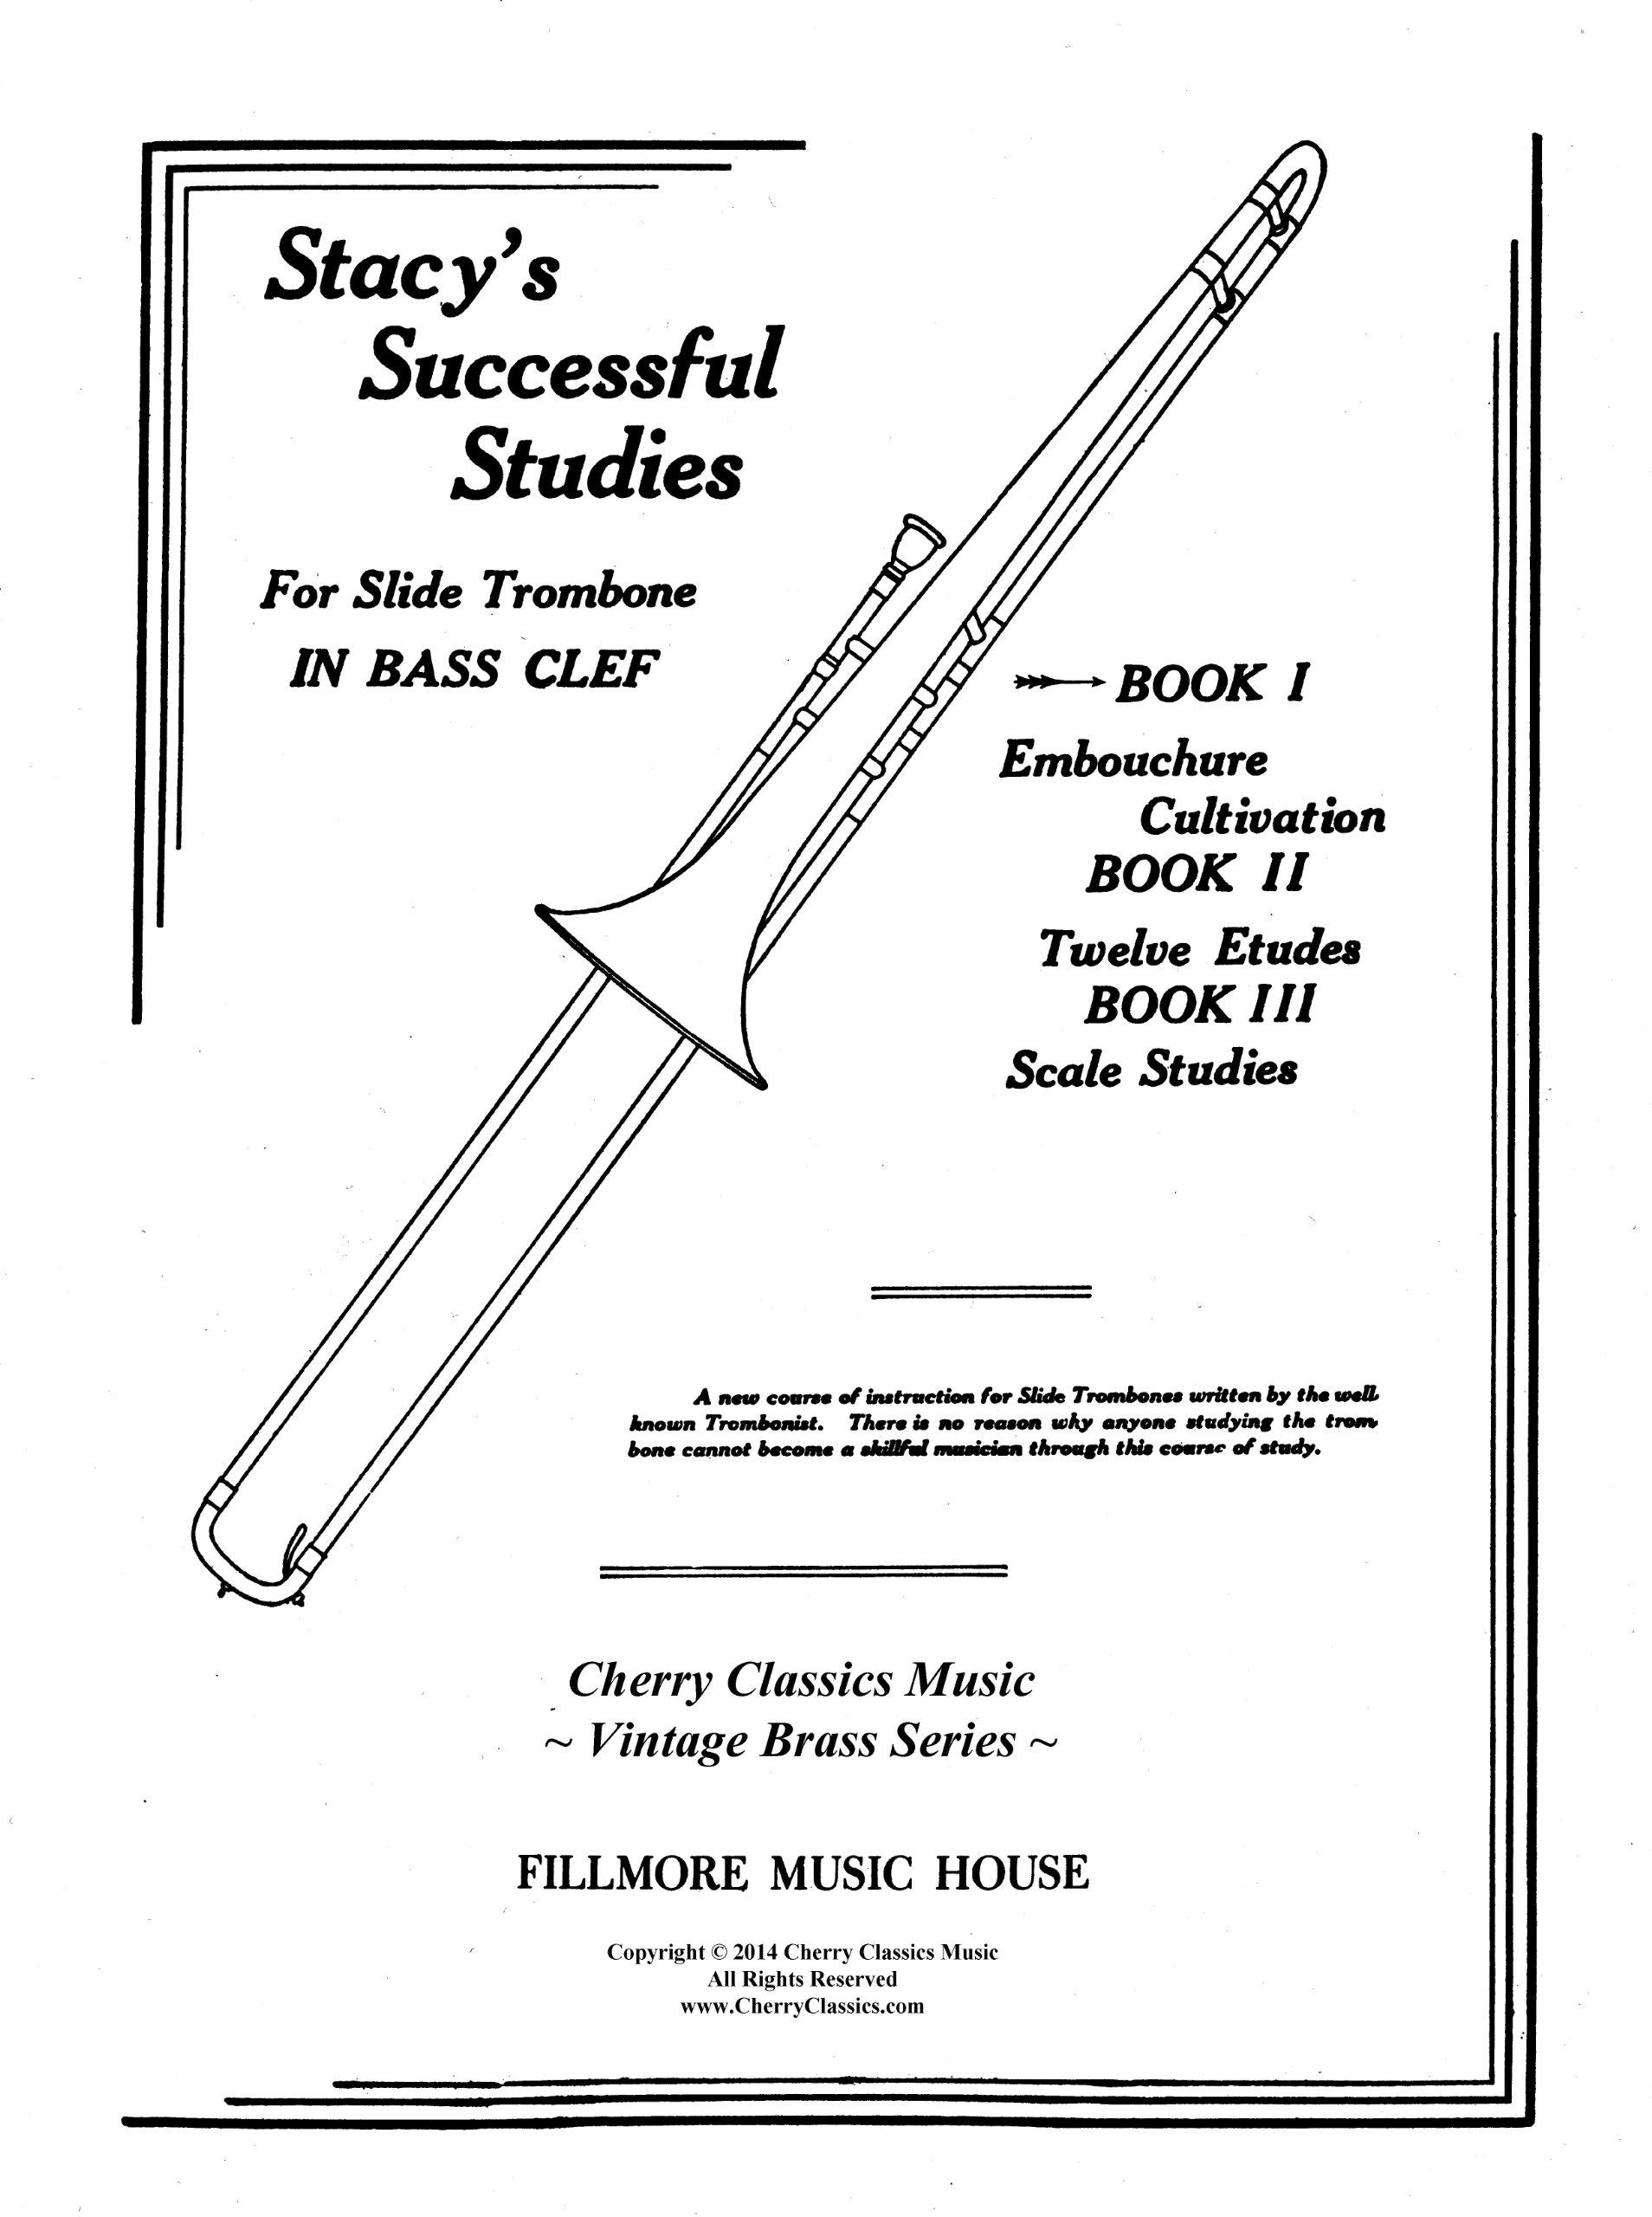 811ZtY8kLdL amazon com stacy's successful studies for trombone (9790530055076